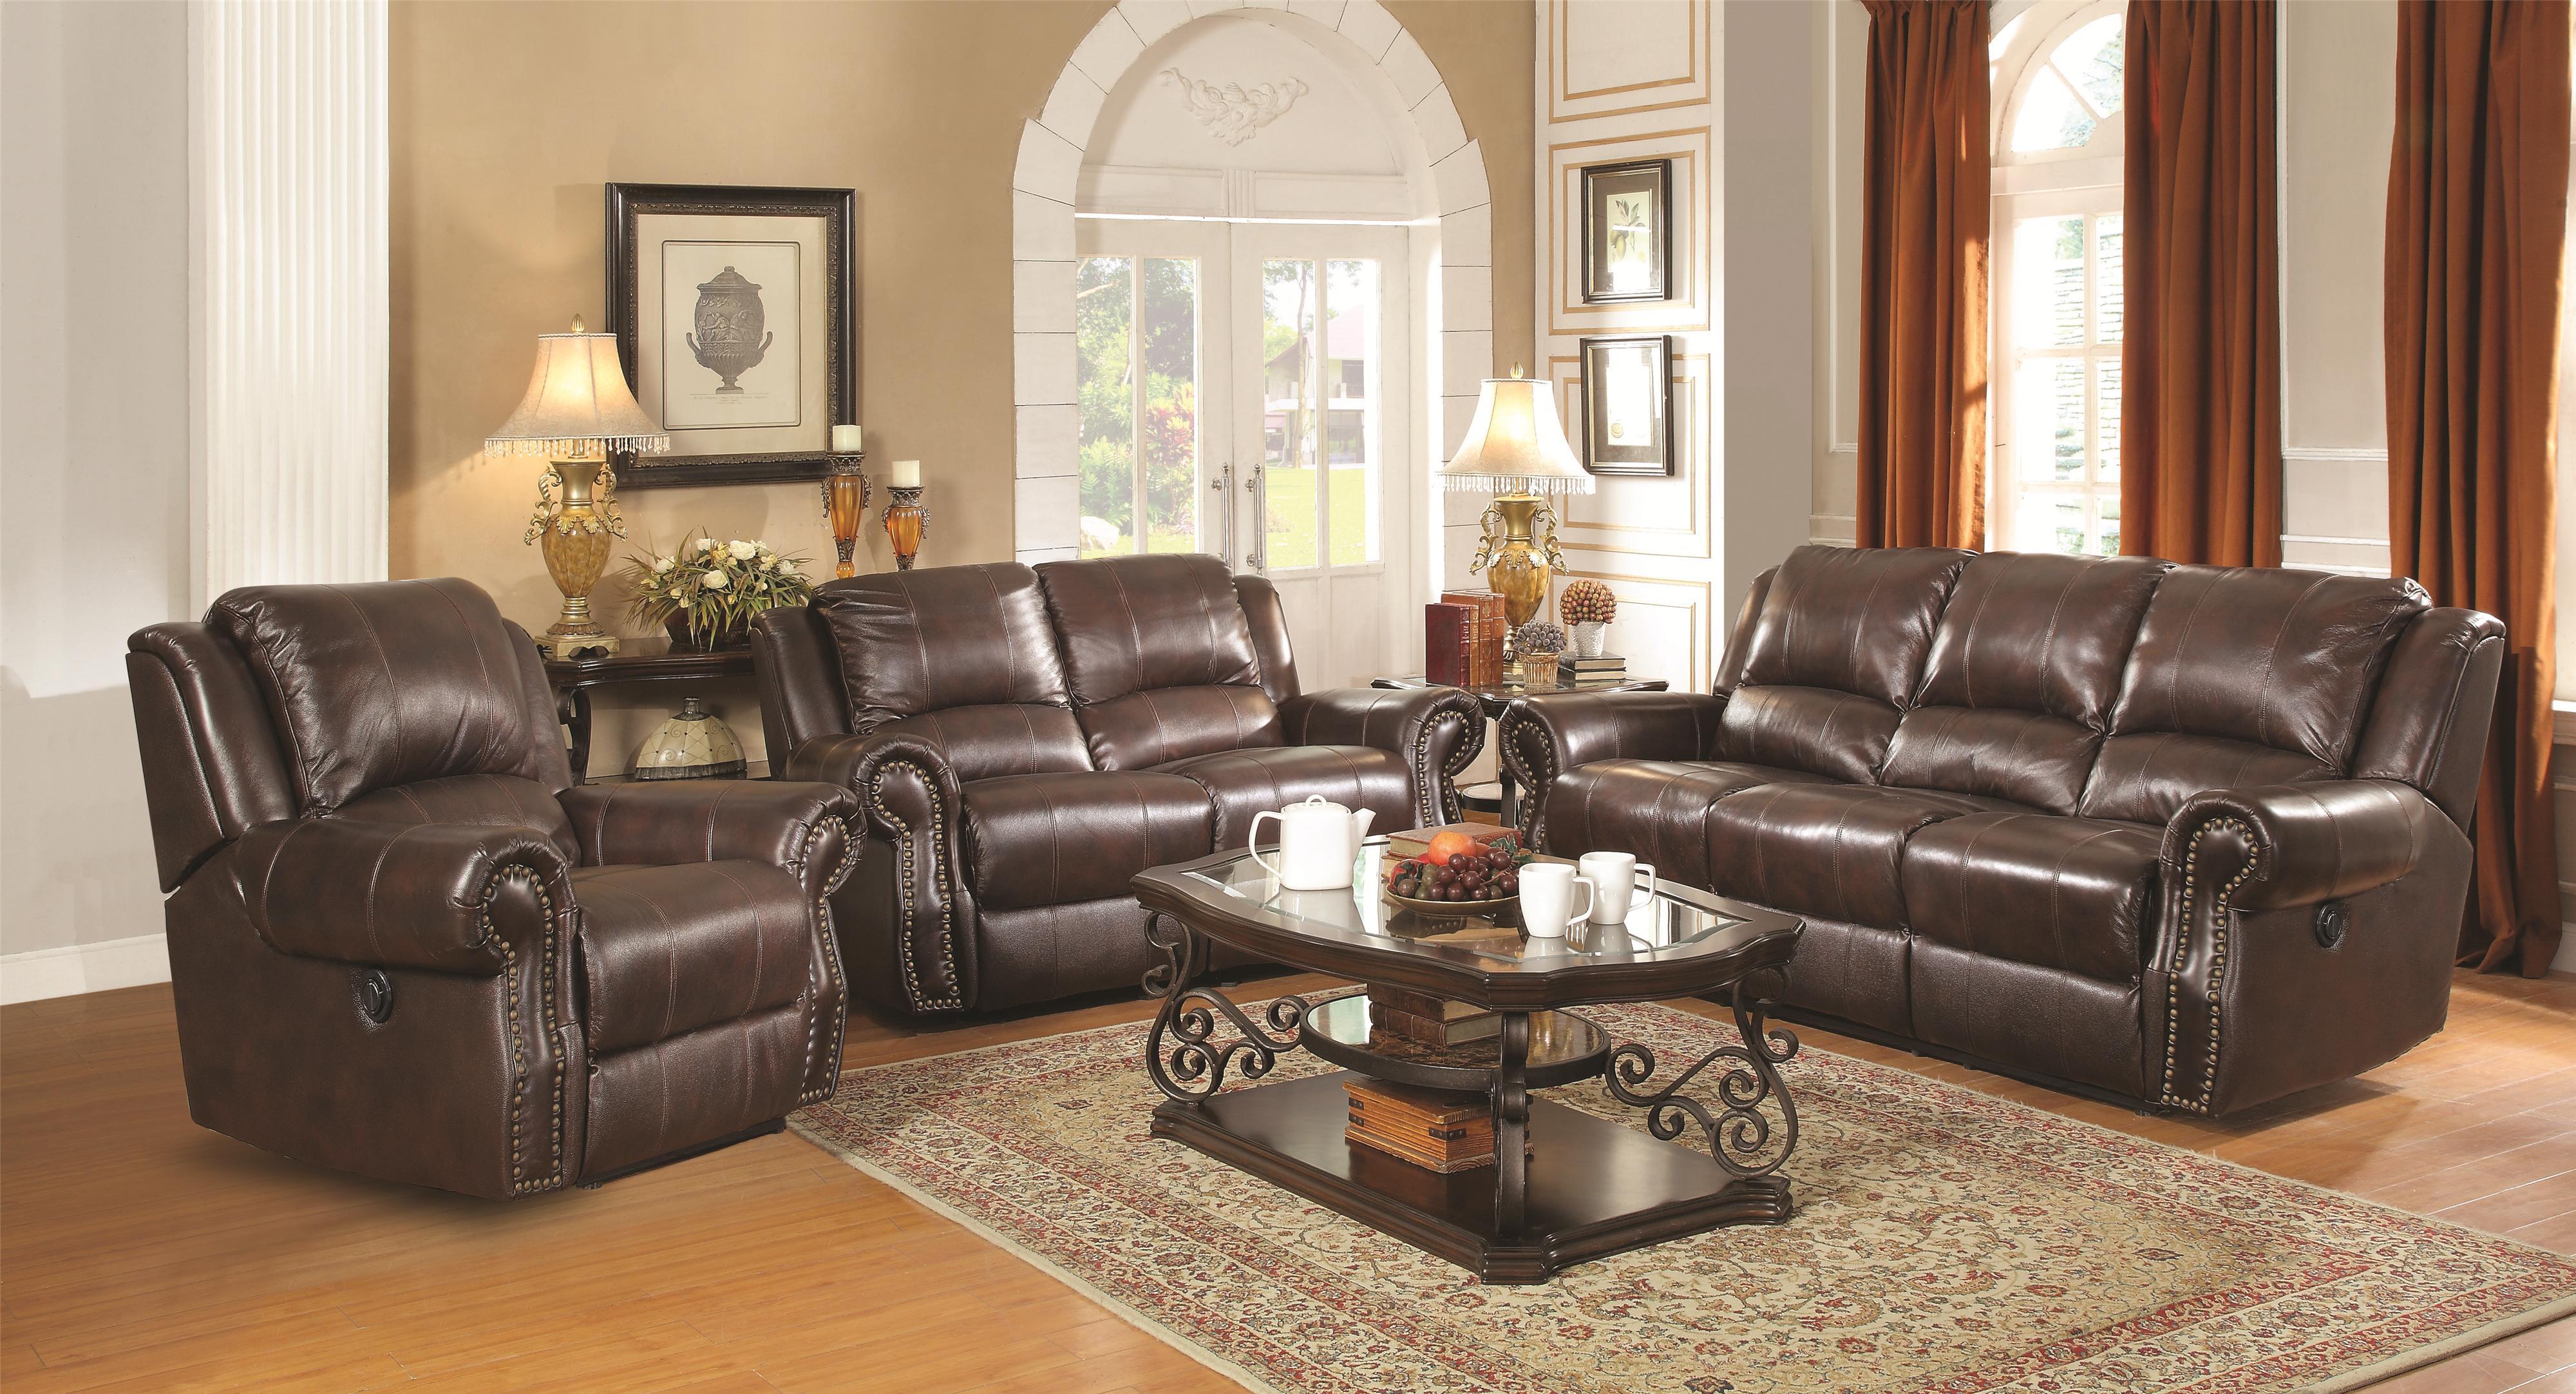 Coaster Sir Rawlinson Traditional Reclining Sofa With